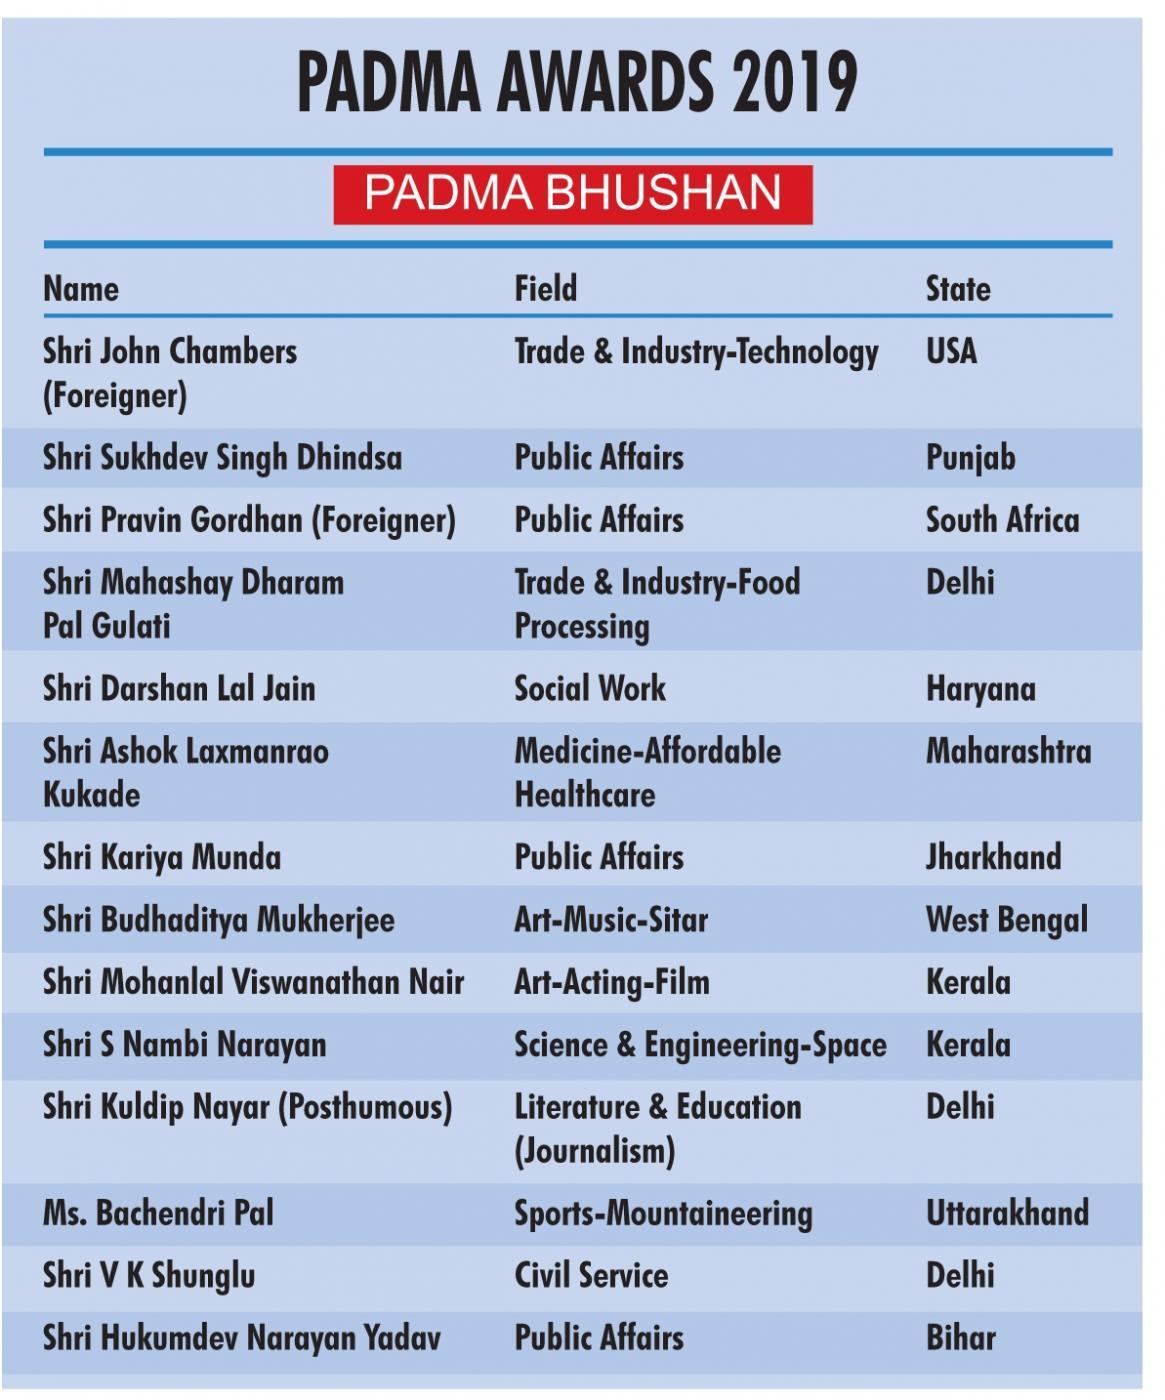 Padma Awards 2019 - Padma Bhushan. (IANS Infographics) by .